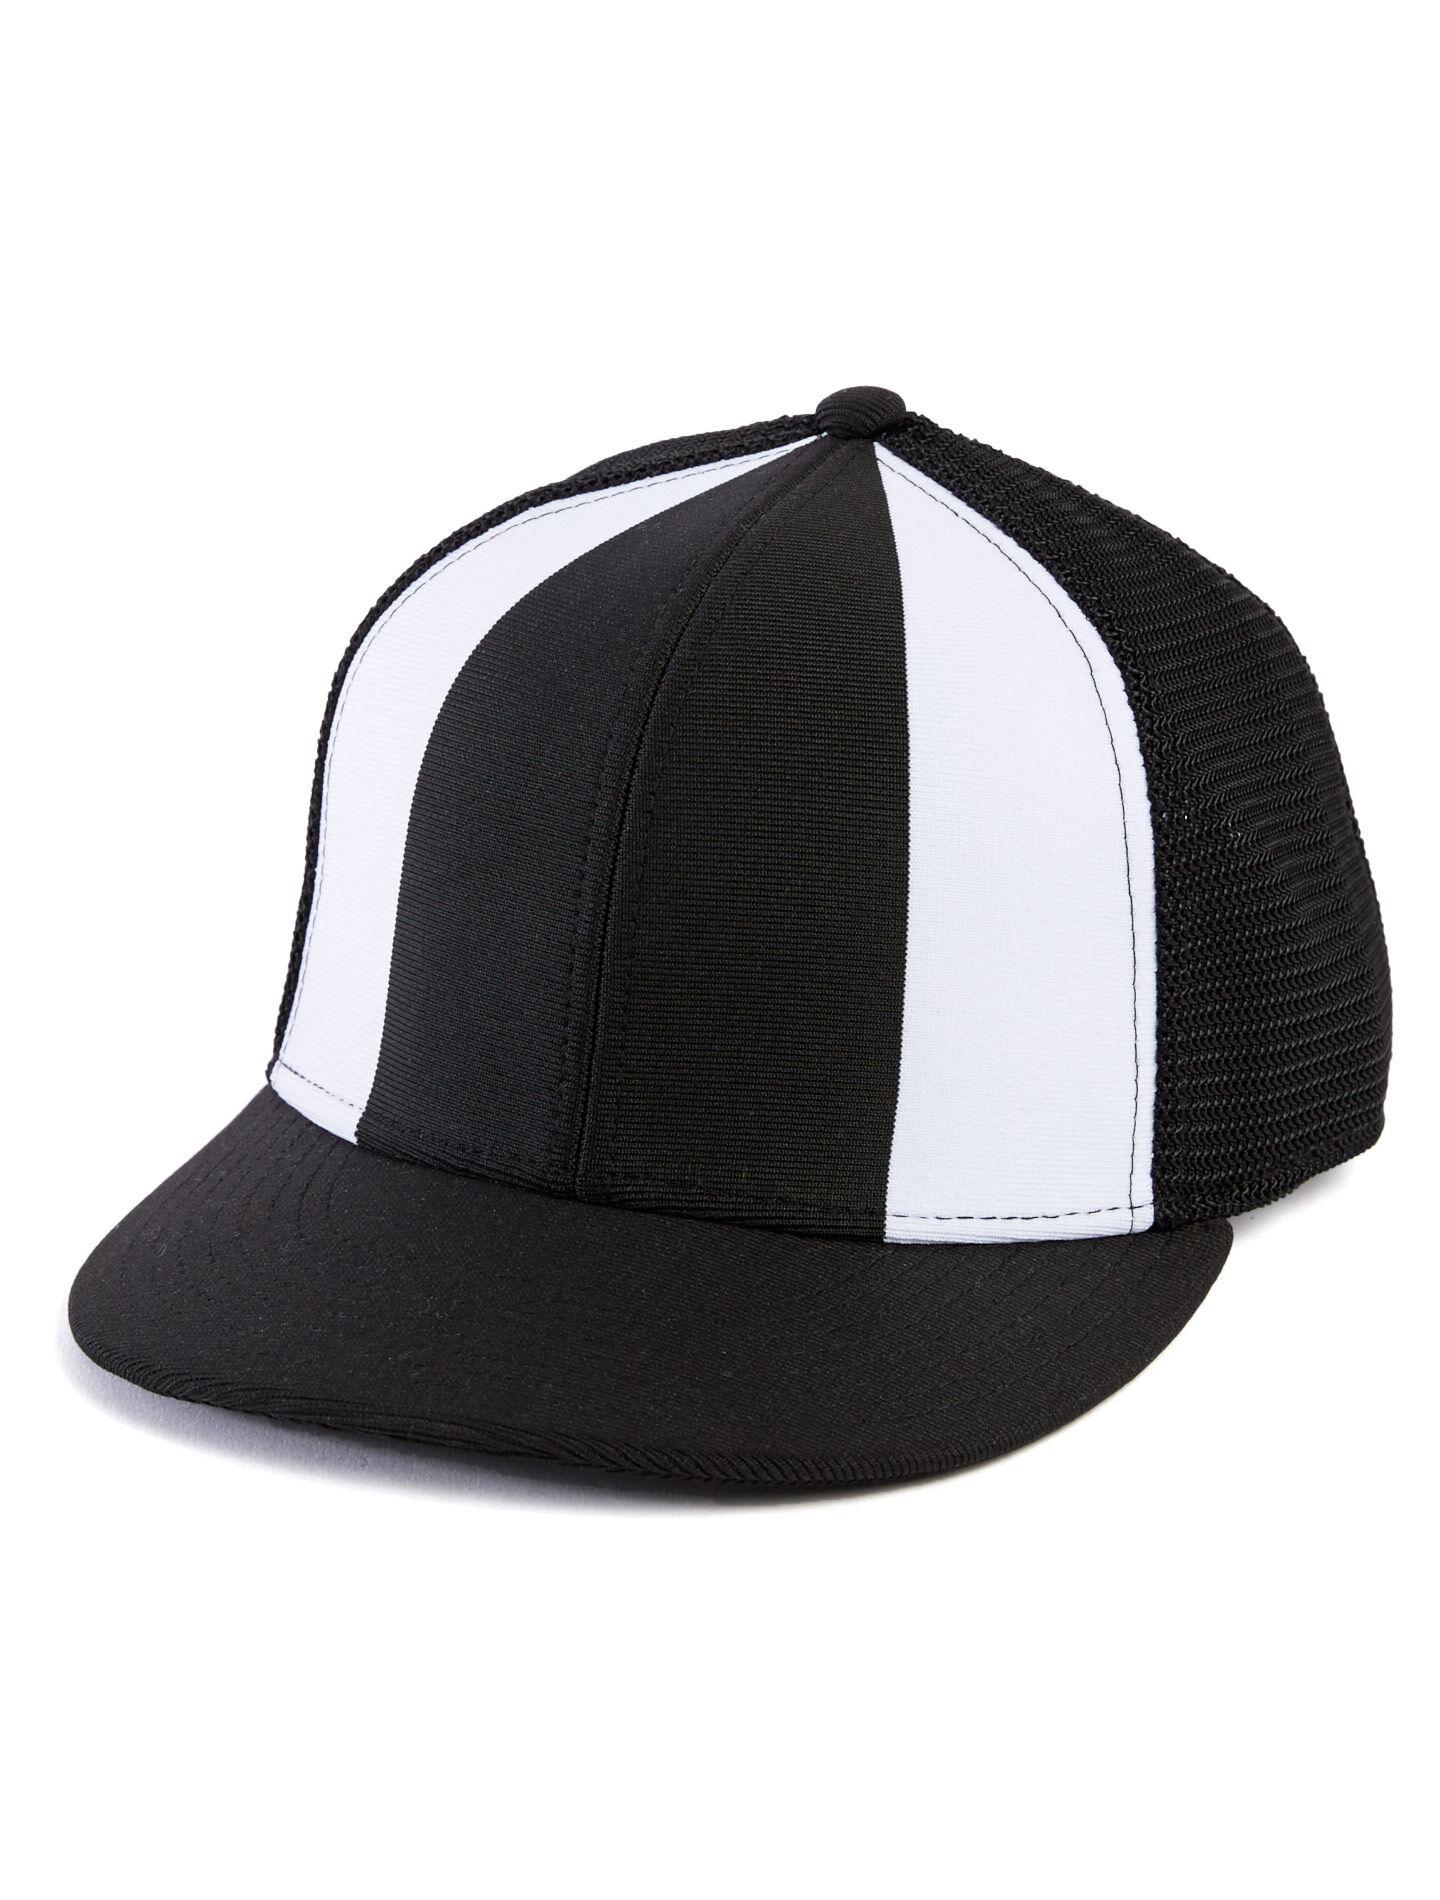 Alternative Apparel The Fenway Ball Cap - Black & White - Size: OS